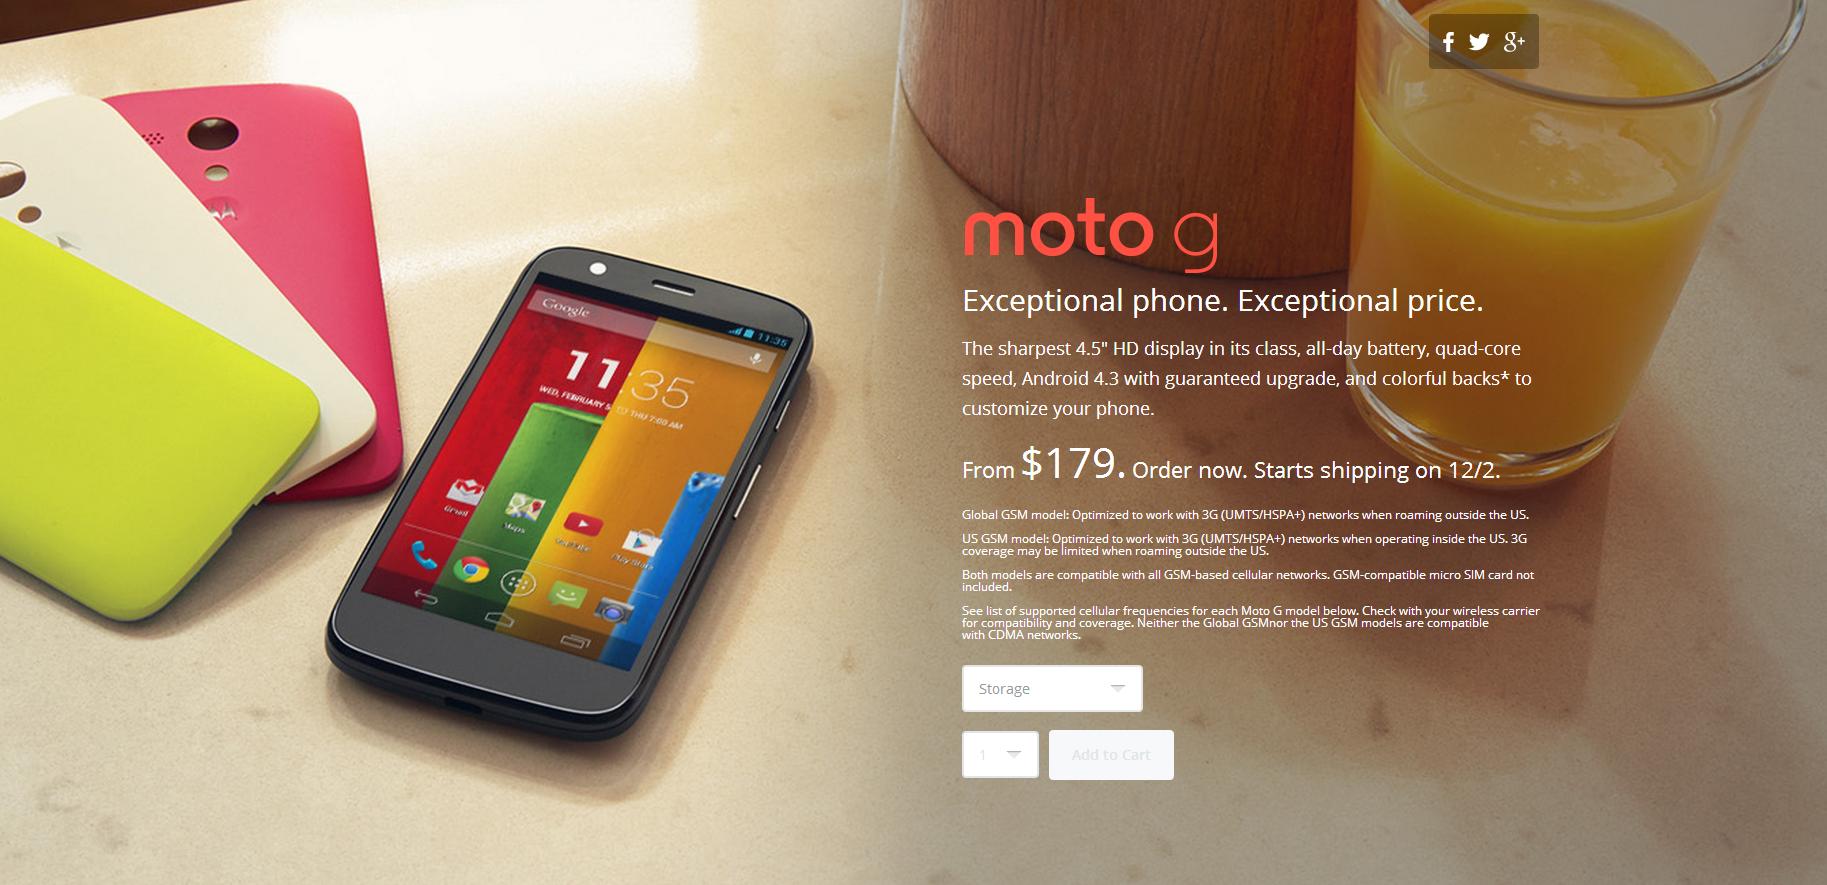 Moto G buy